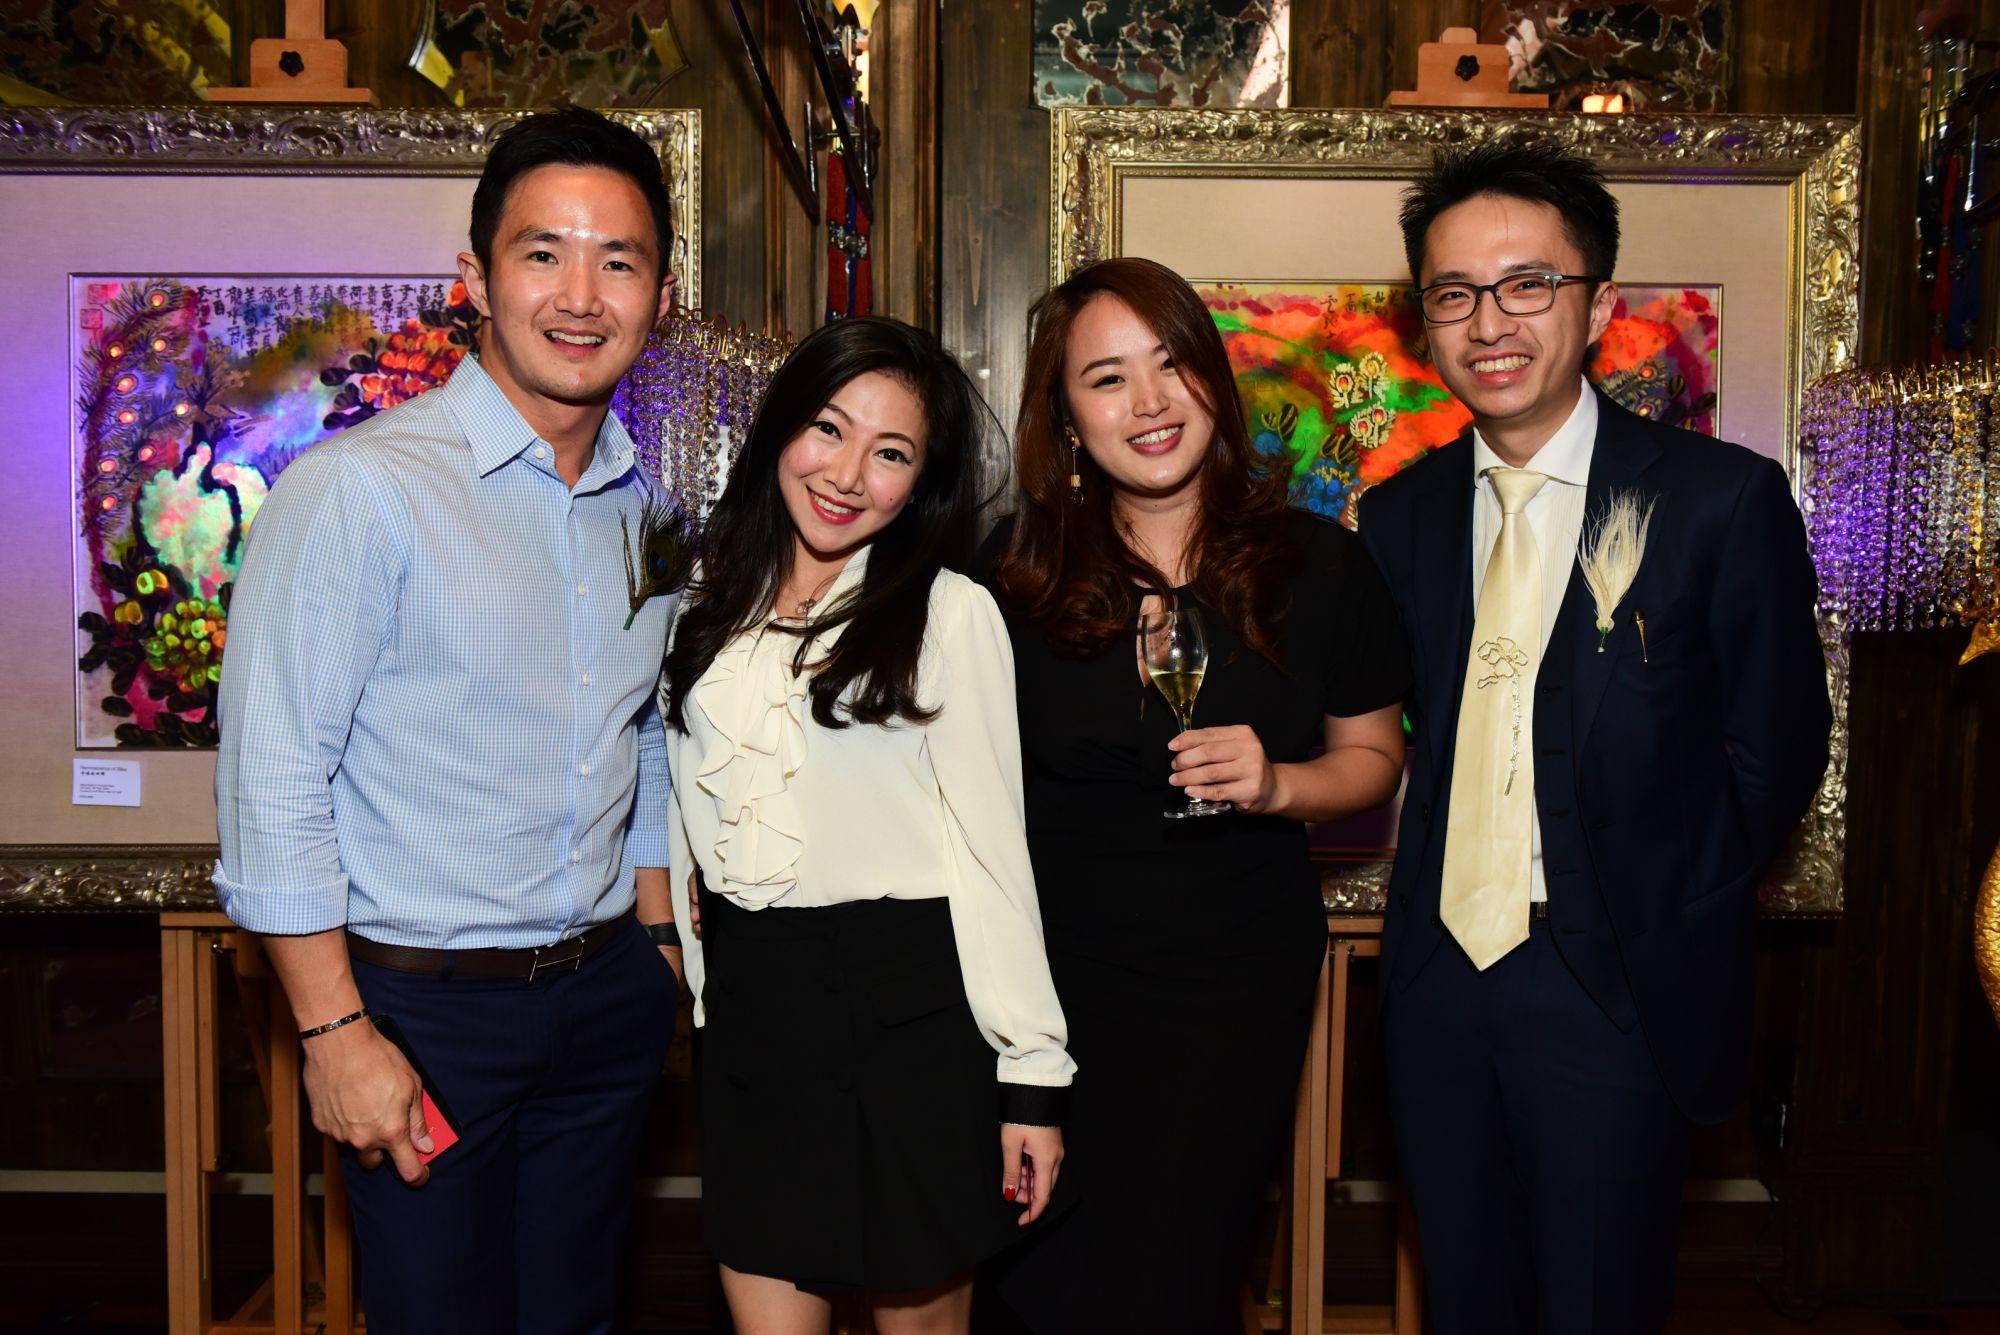 Jeremy Lai, Marissa Wang, Janell Kwek, Kan Ying Loong